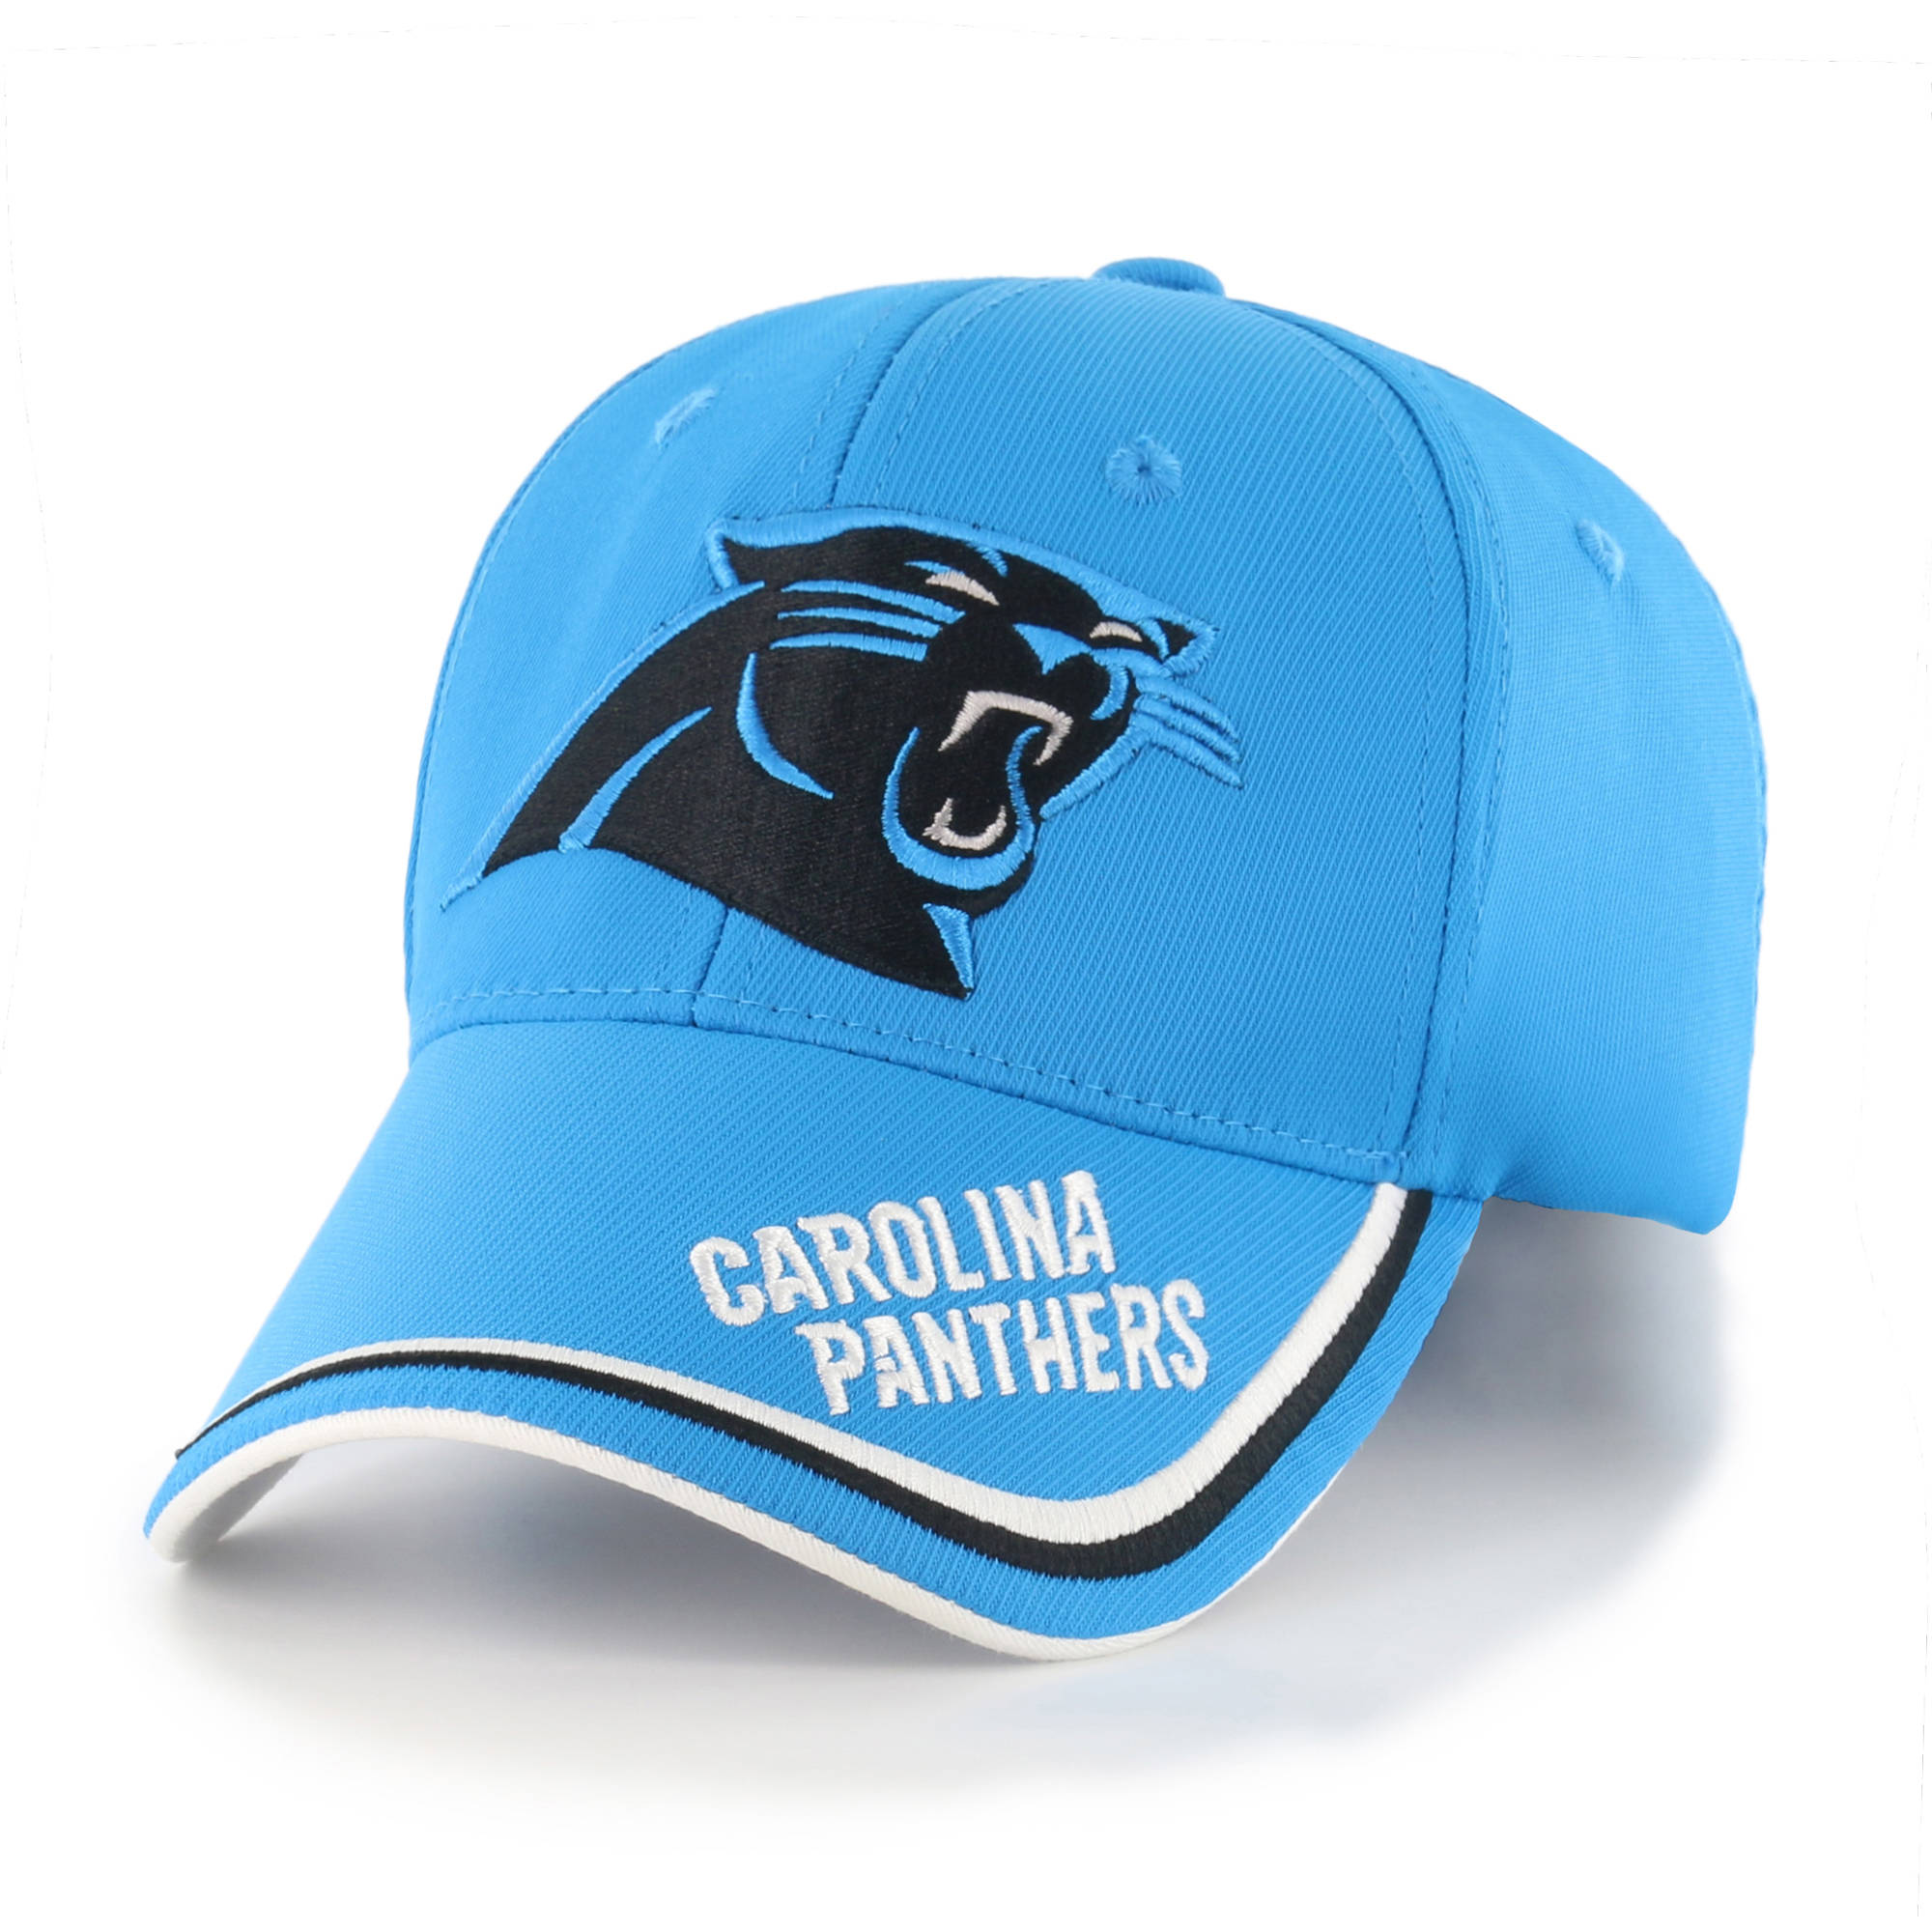 NFL Carolina Panthers Forest Cap / Hat by Fan Favorite